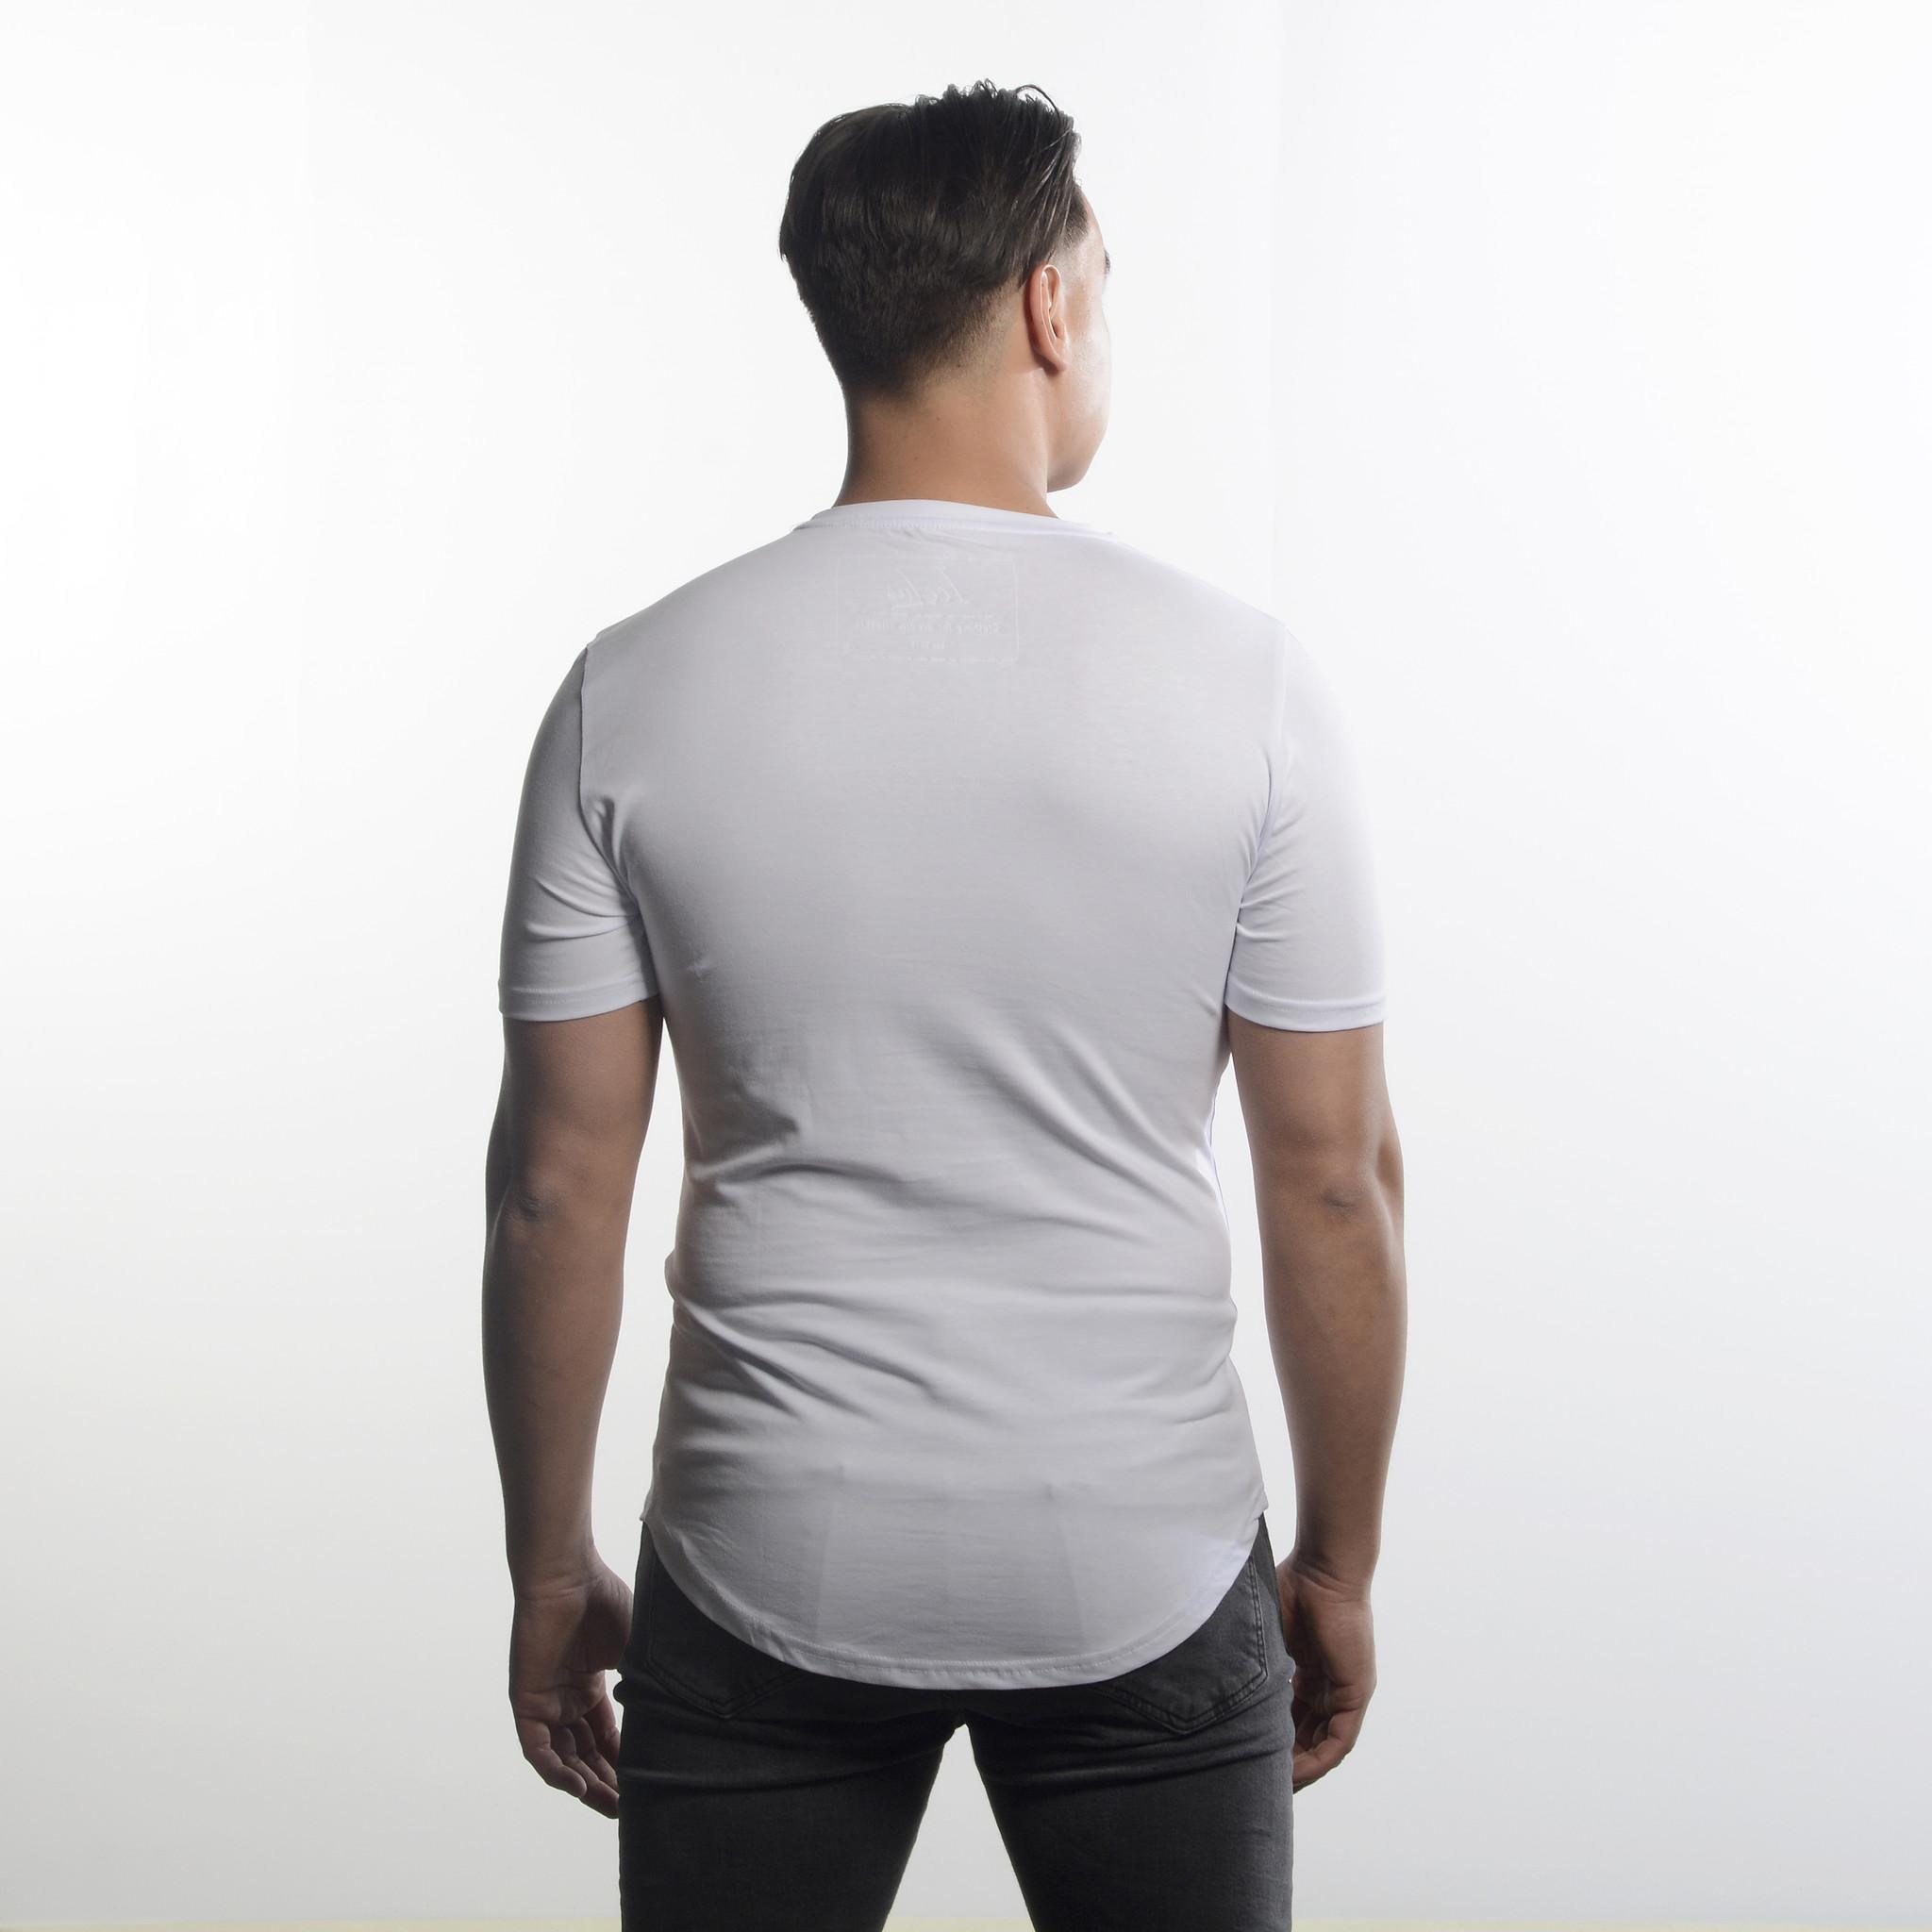 Icelus Clothing Ganster Series White